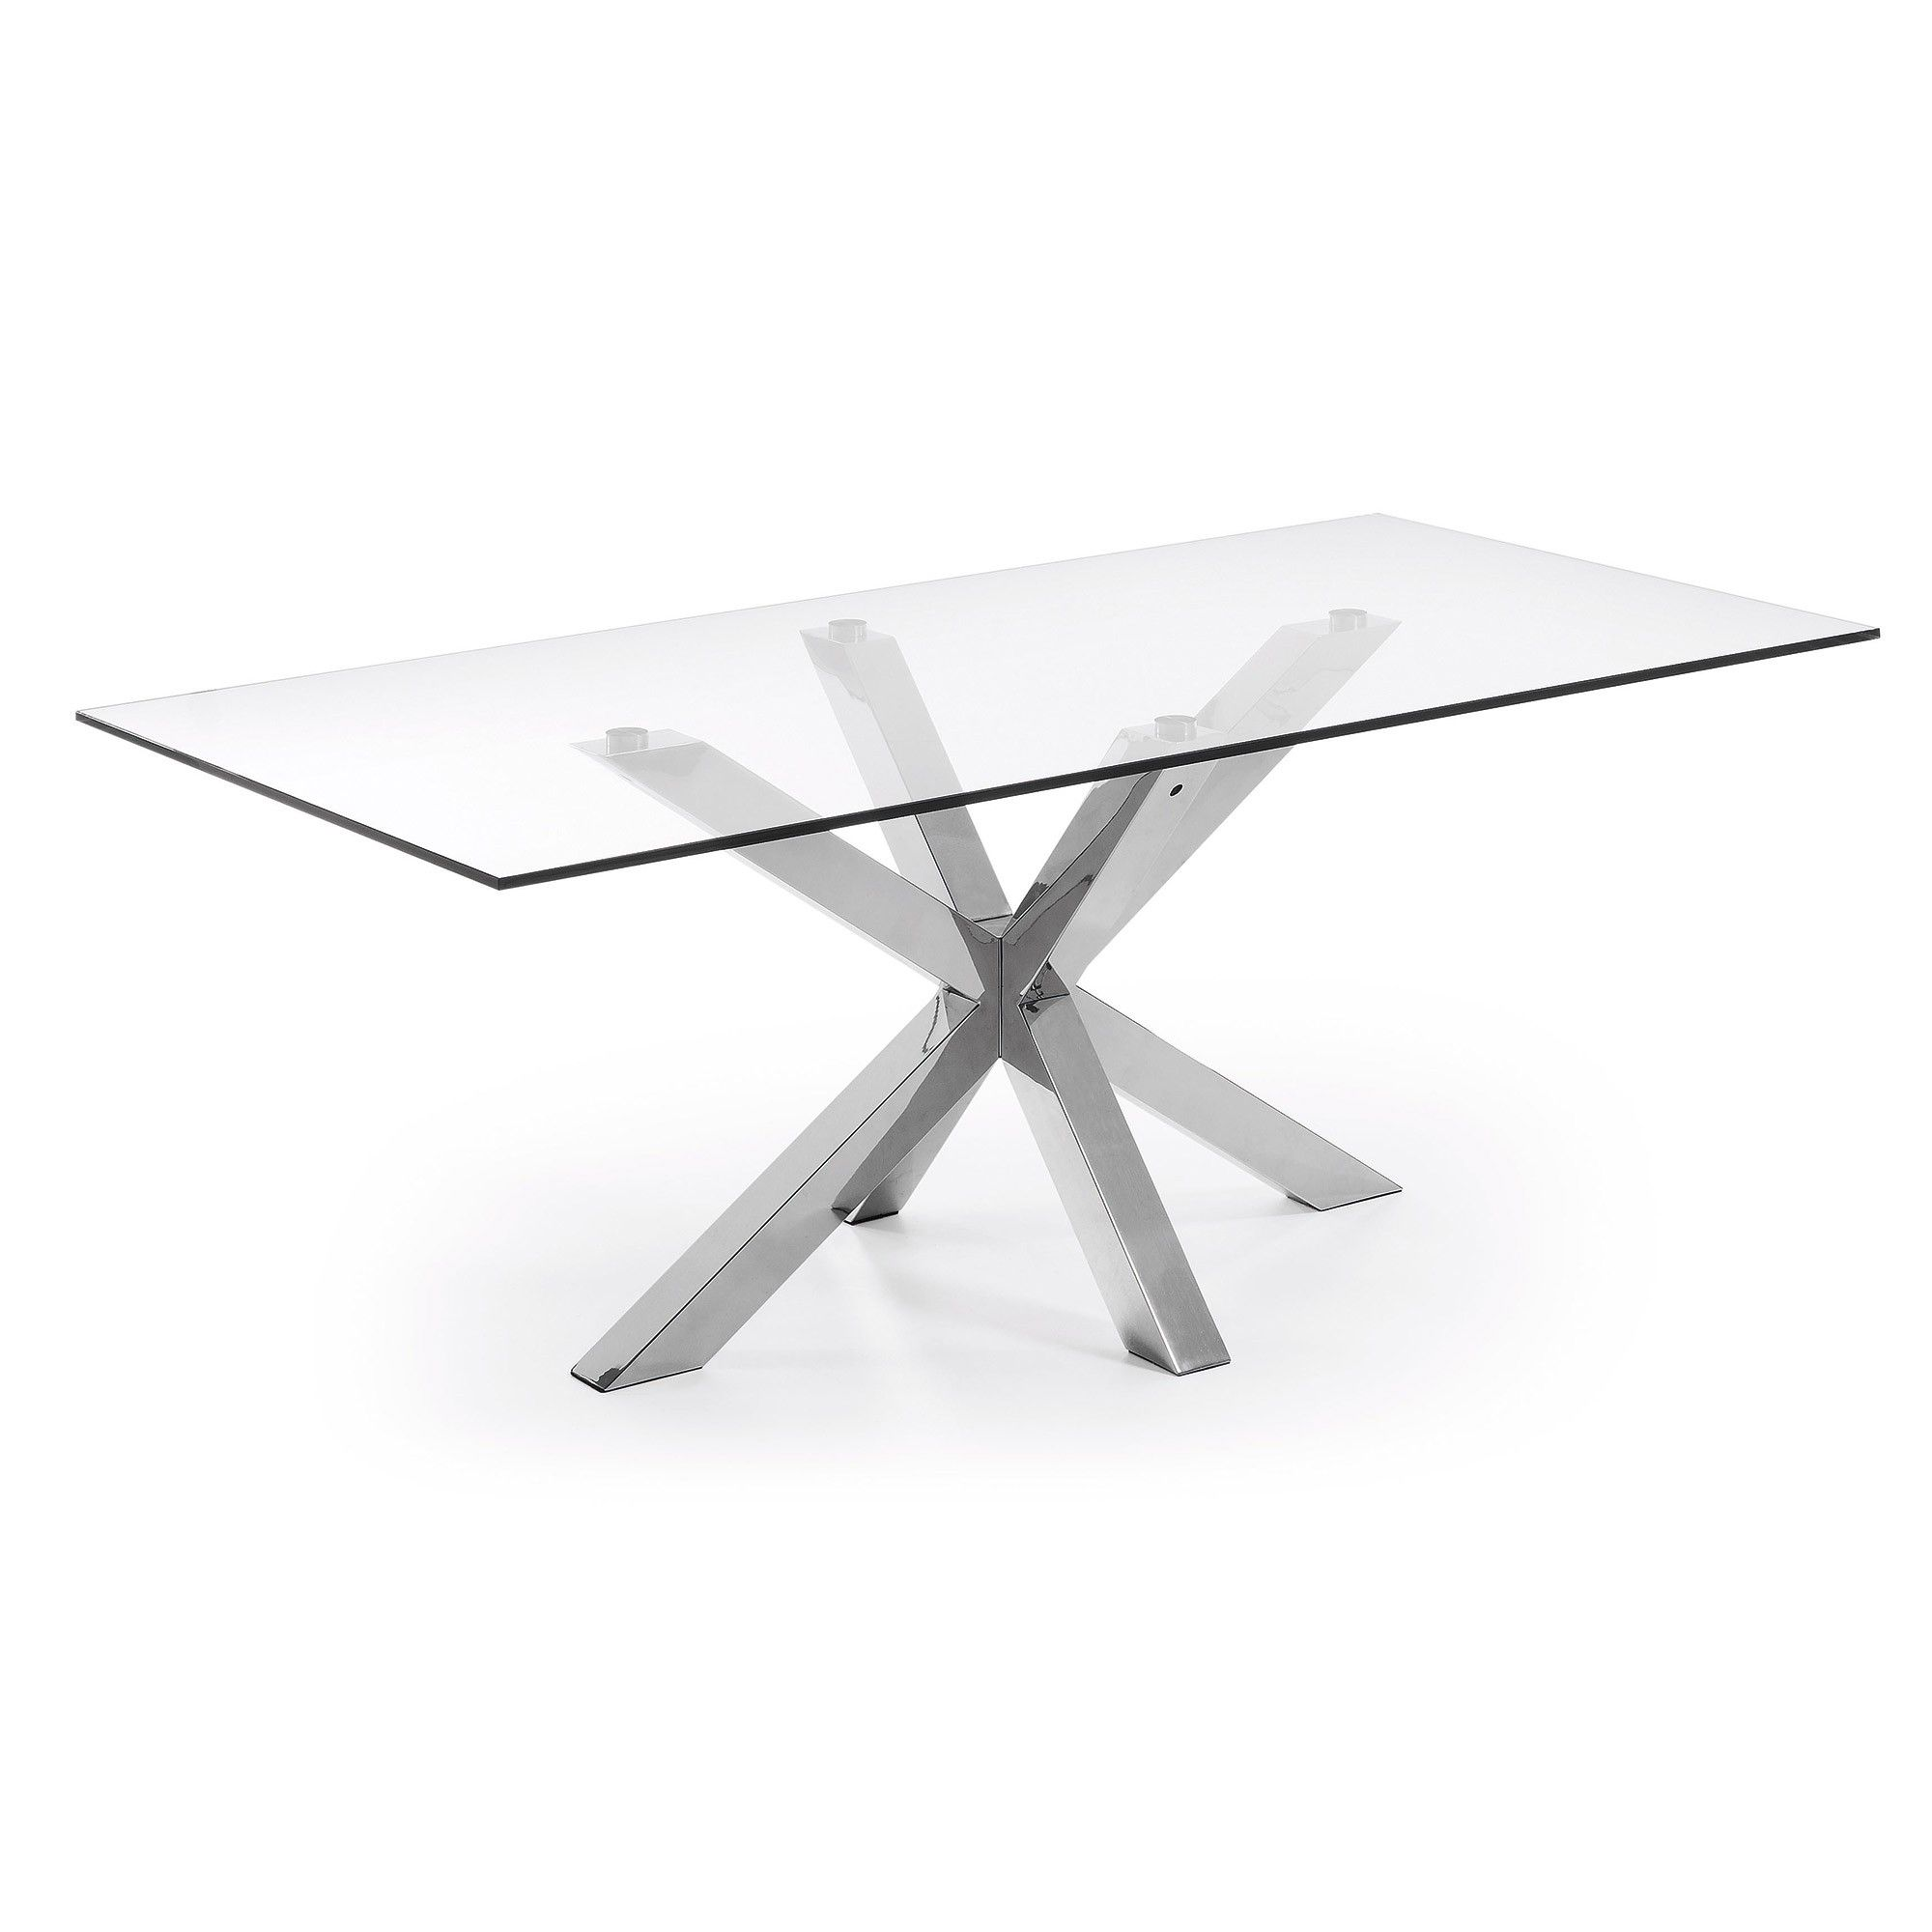 Table Argo 200x100 Cm Inox Et Verre Table Cuisine Pinterest